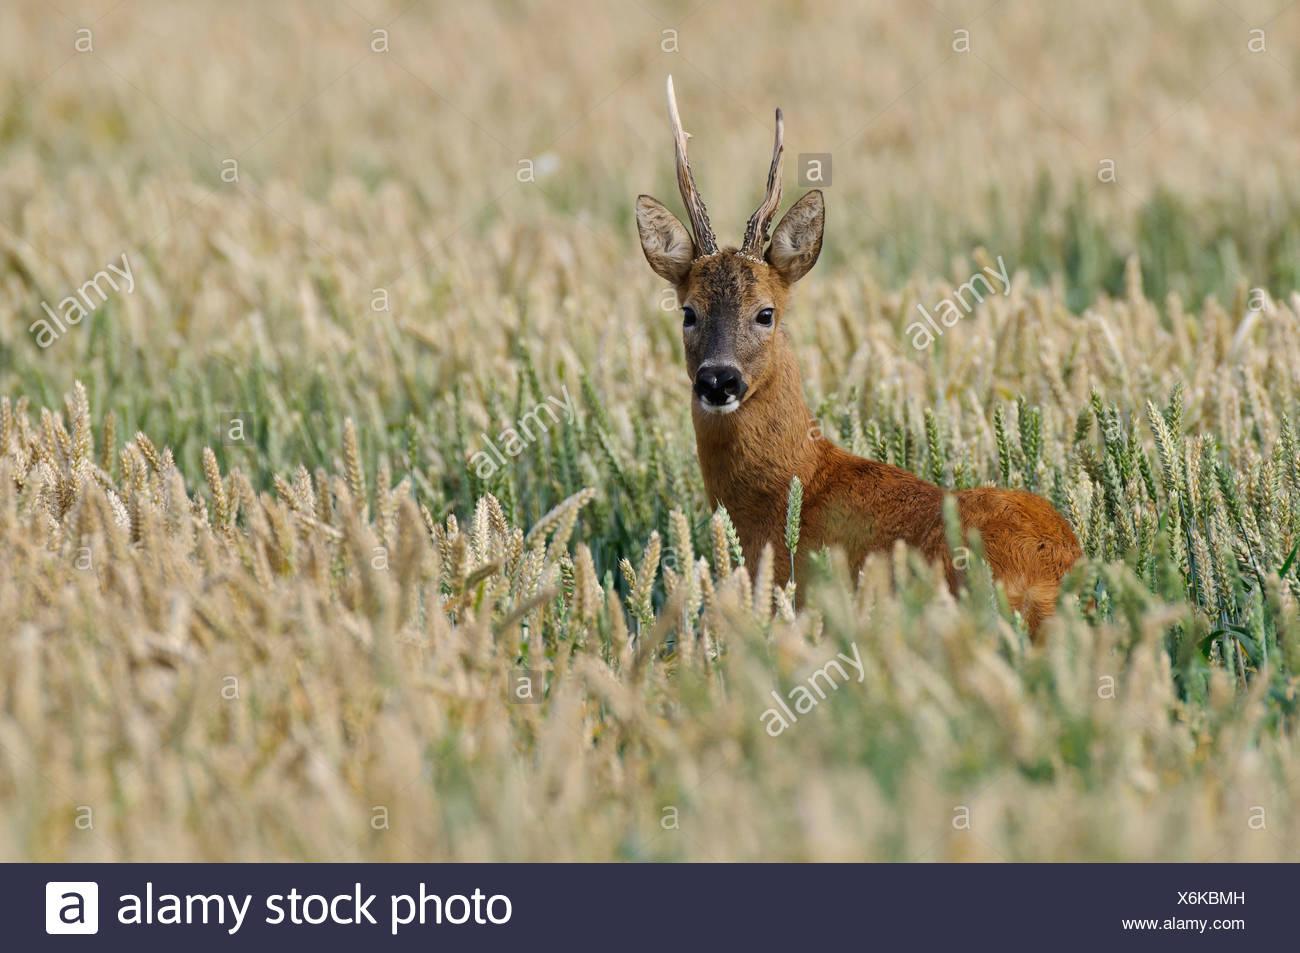 roebuck in field, capreolus capreolus - Stock Image